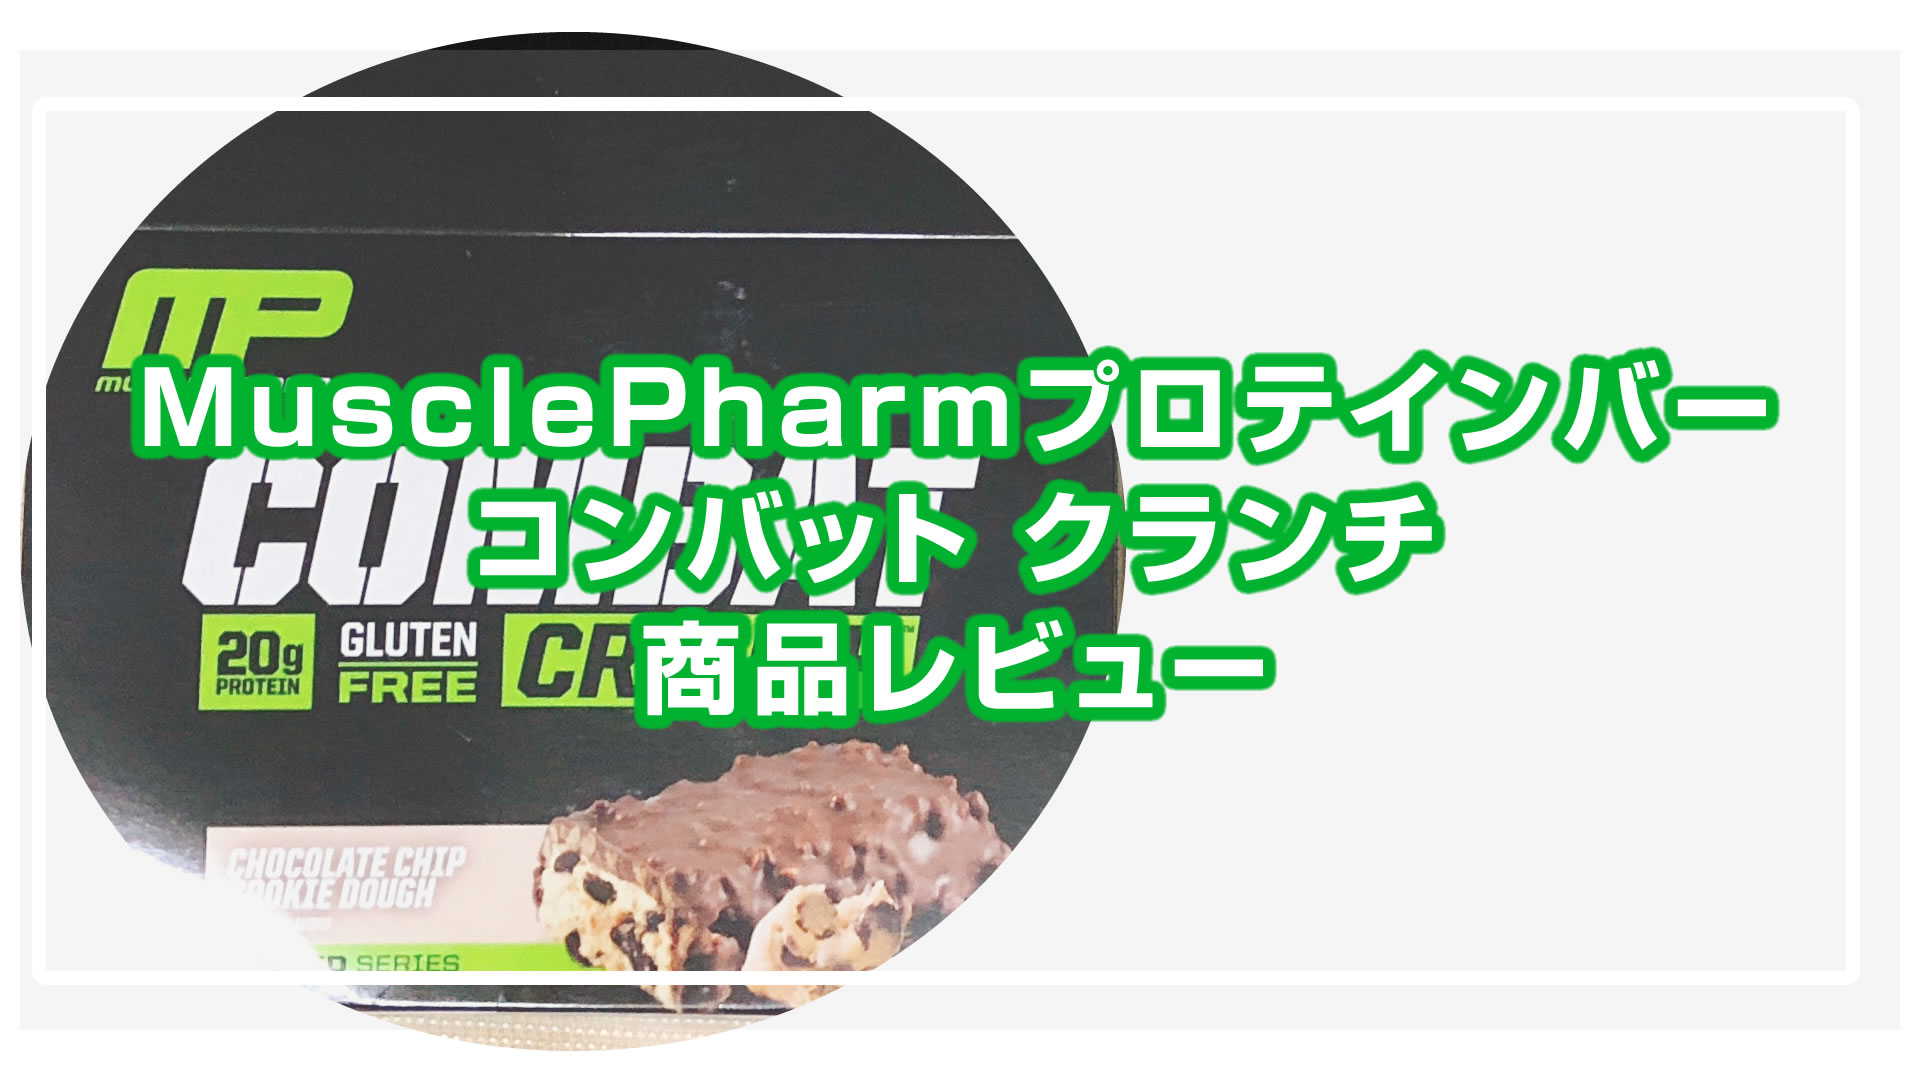 MusclePharmのプロテインバー「コンバット クランチ」のレビュー!